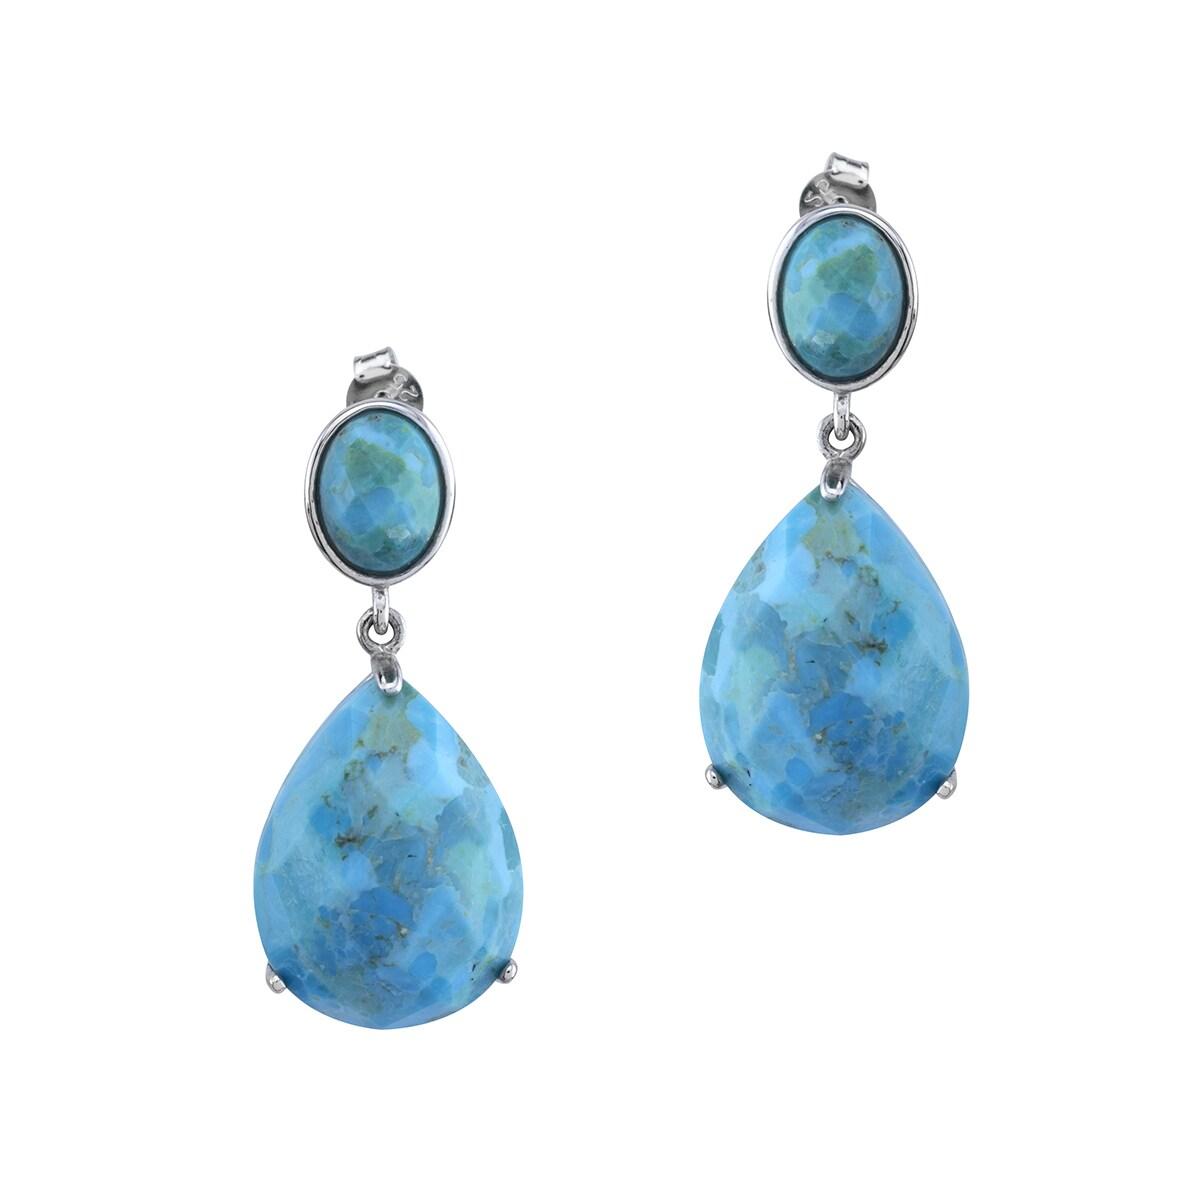 Matrix Pangea Mines 20x15mm Turquoise Drop Earrings, Wome...